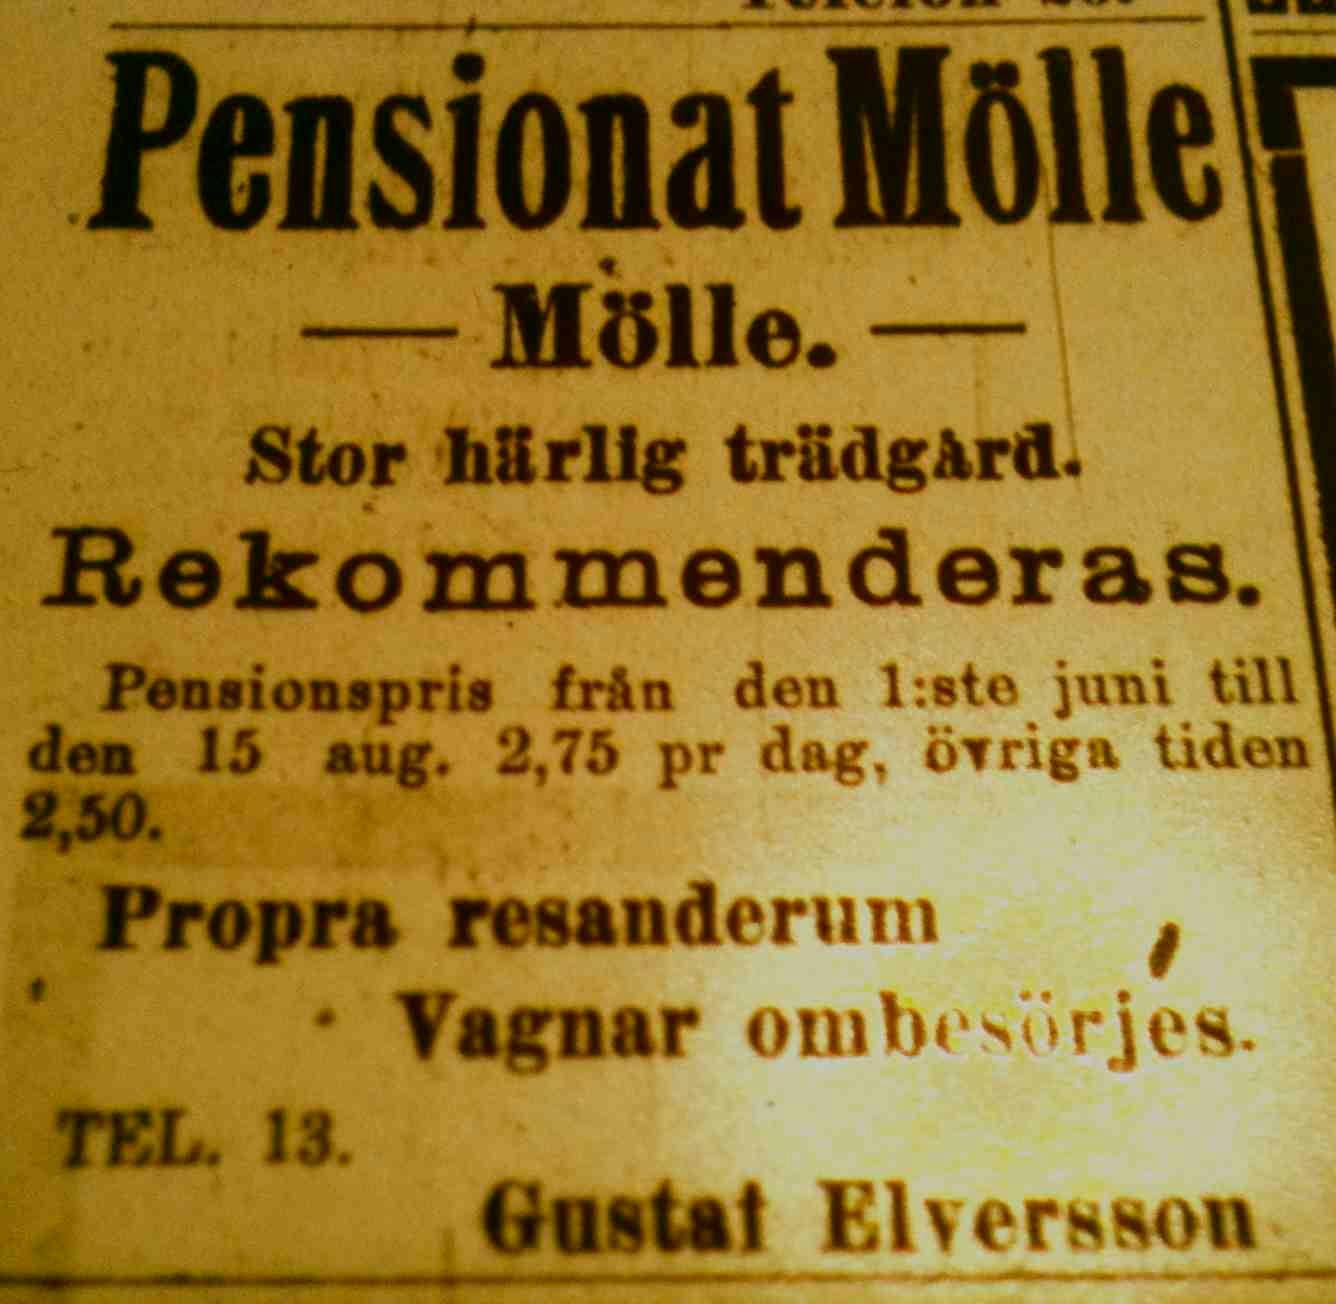 Turisthotellet (Pensionat Molle) 1913